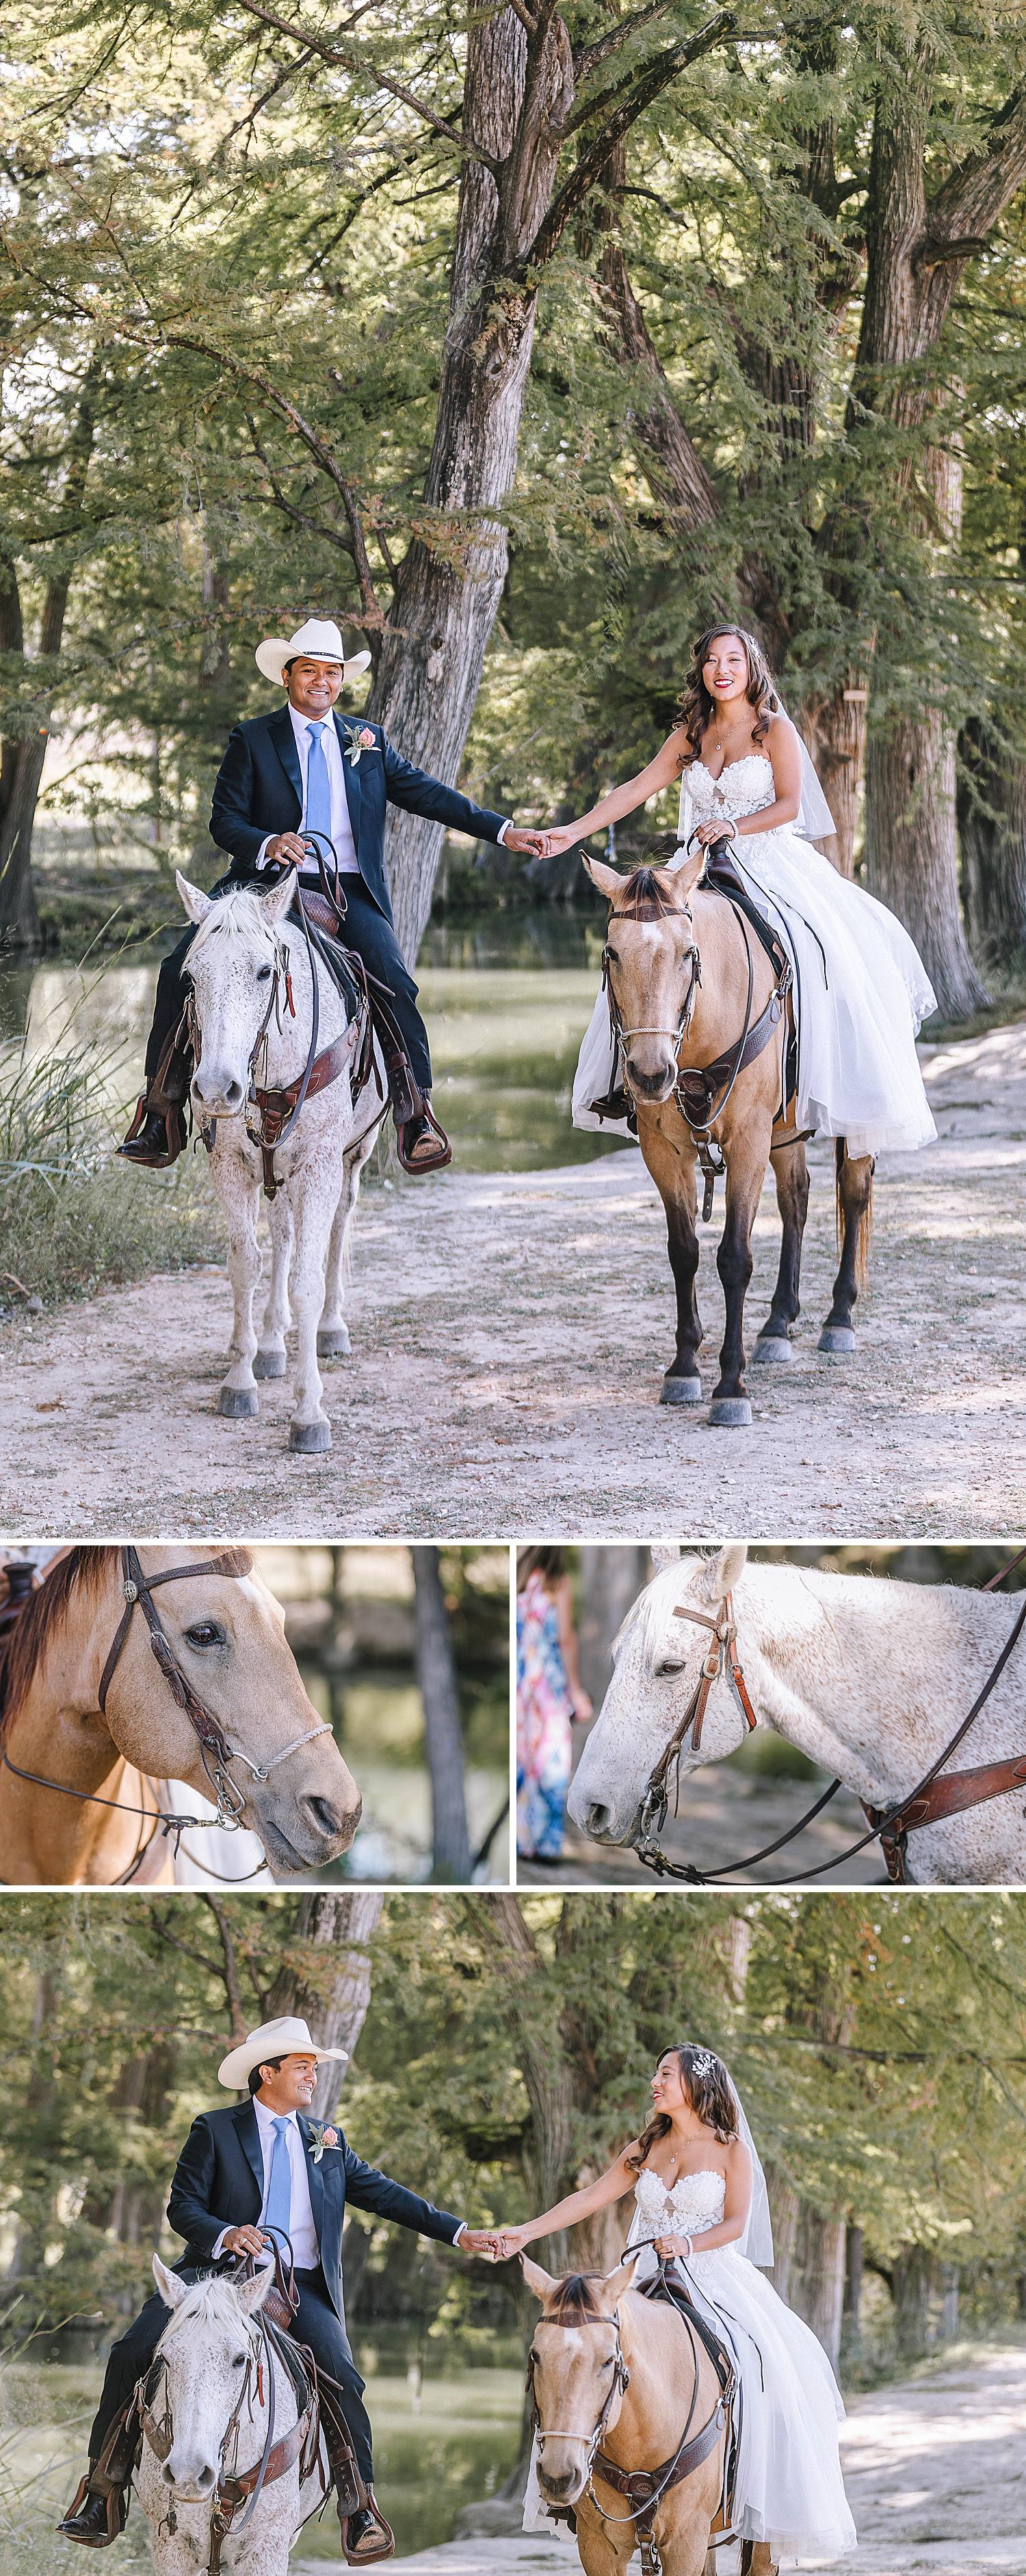 Bandera-Texas-Wedding-Photographer-Bride-Groom-on-Horses-Carly-Barton-Photography_0030.jpg